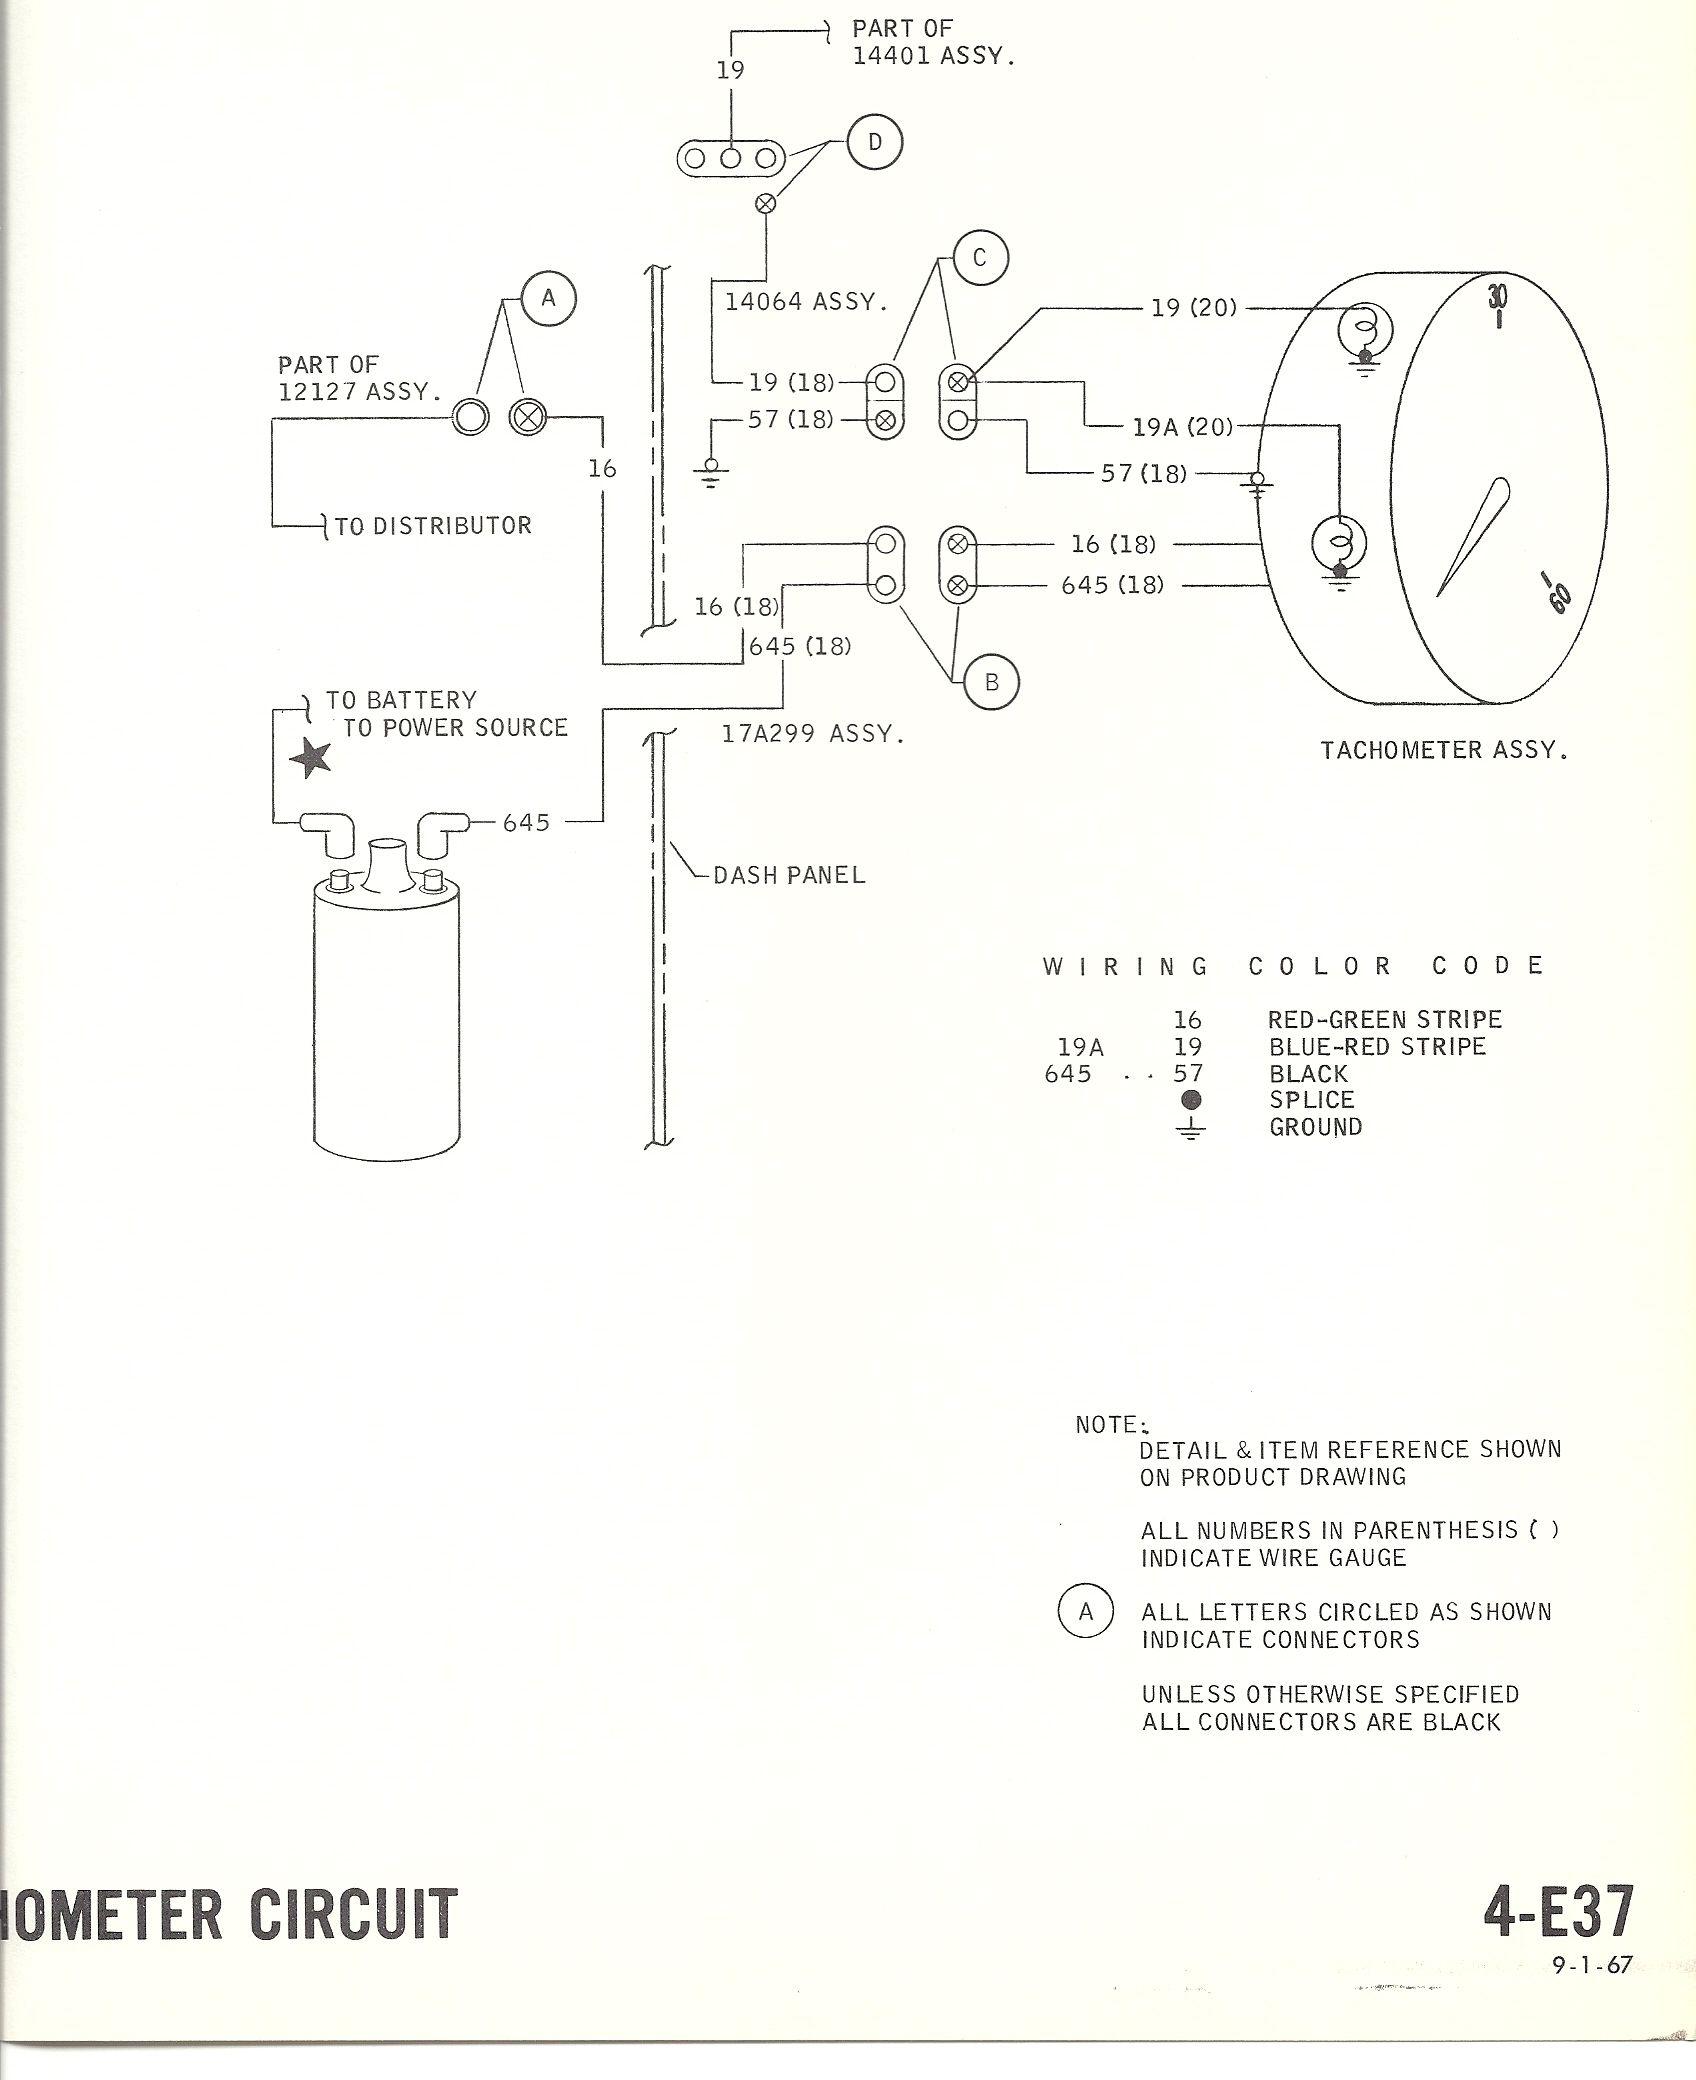 67 Camaro Headlight Wiring Diagram